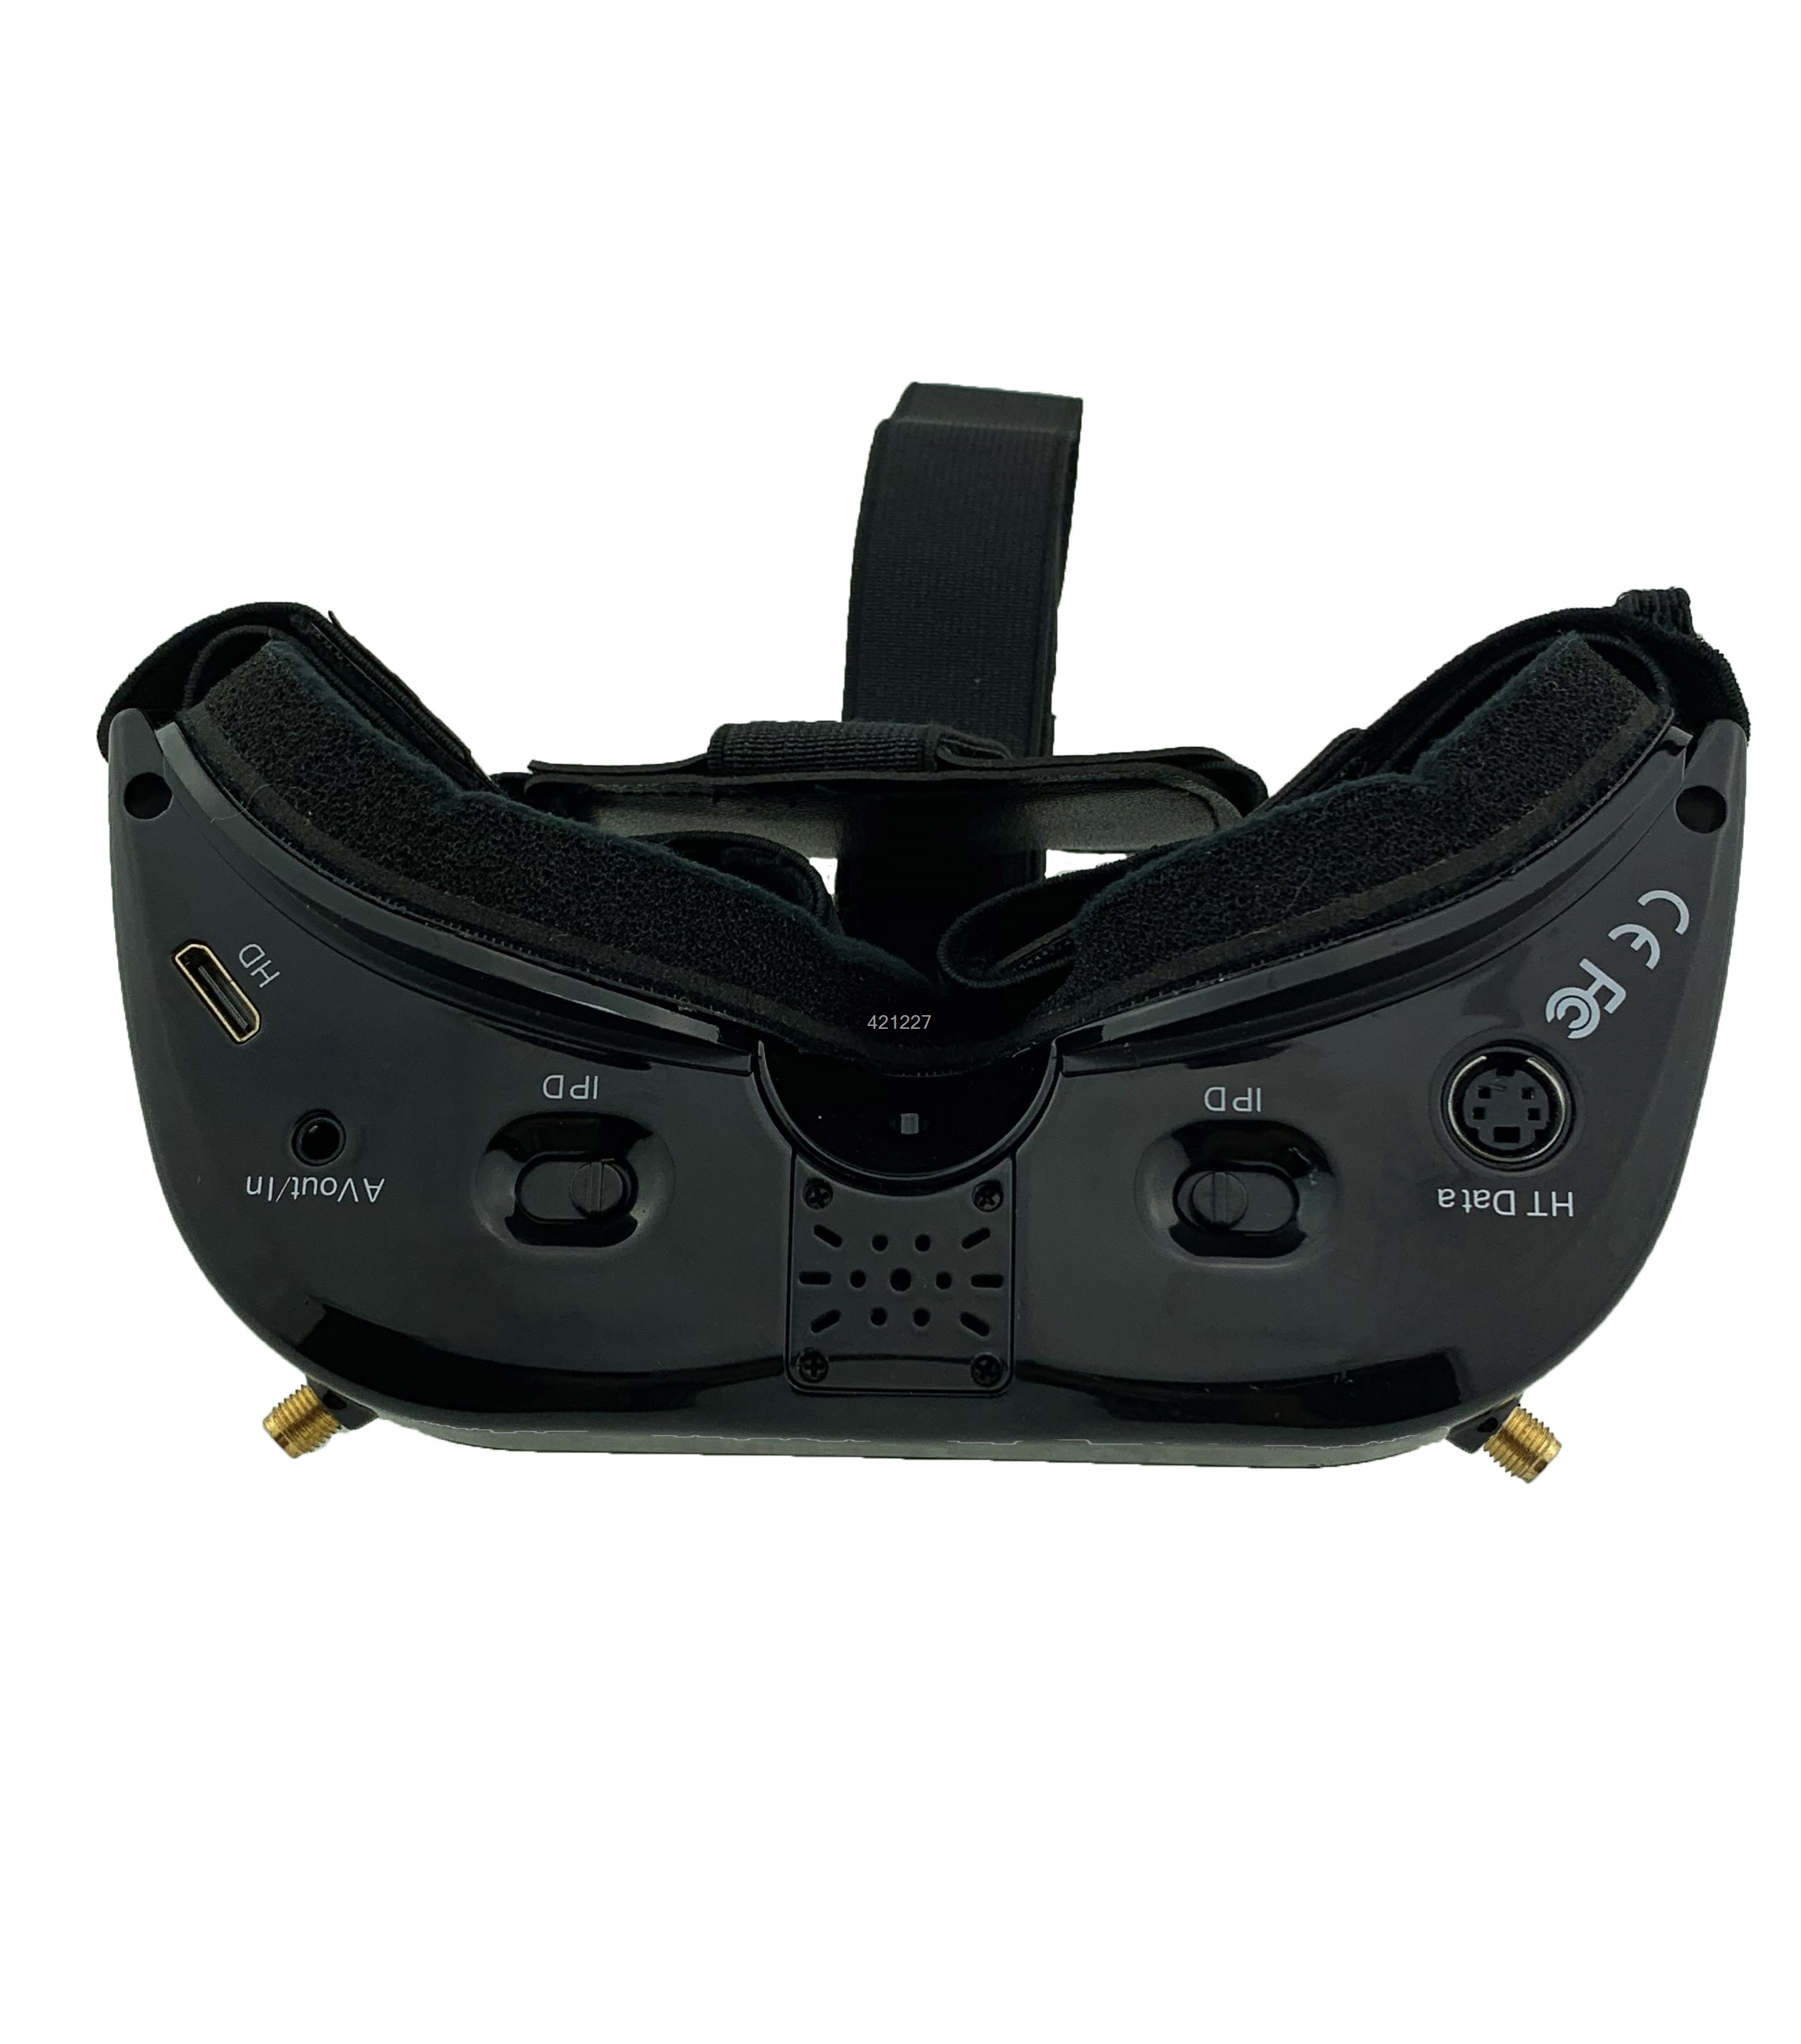 2019 New Aomway Commander Goggles V1S 2D 3D 64CH 5.8G FPV Video Headset Support HDMI 720p DVR Headtracker Instead V1 v2 - 4